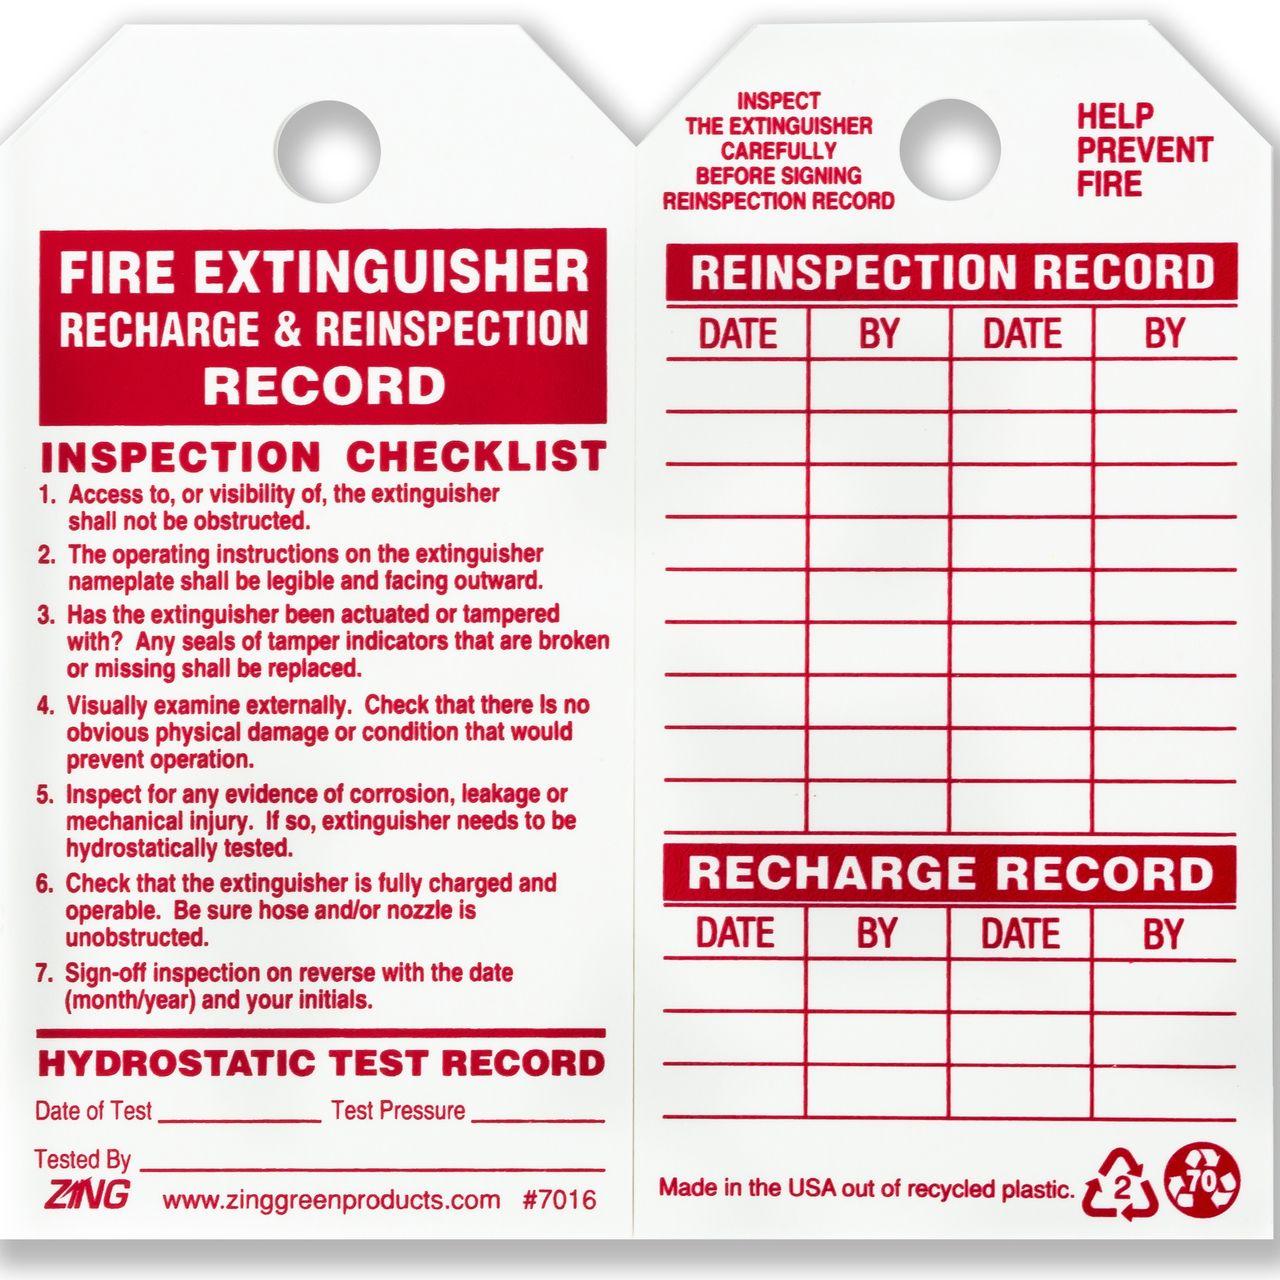 Zing 7016 Eco Safety Tag Fire Extinguisher 5 75hx3w 10 Pack Fire Extinguisher Extinguisher Inspection Checklist